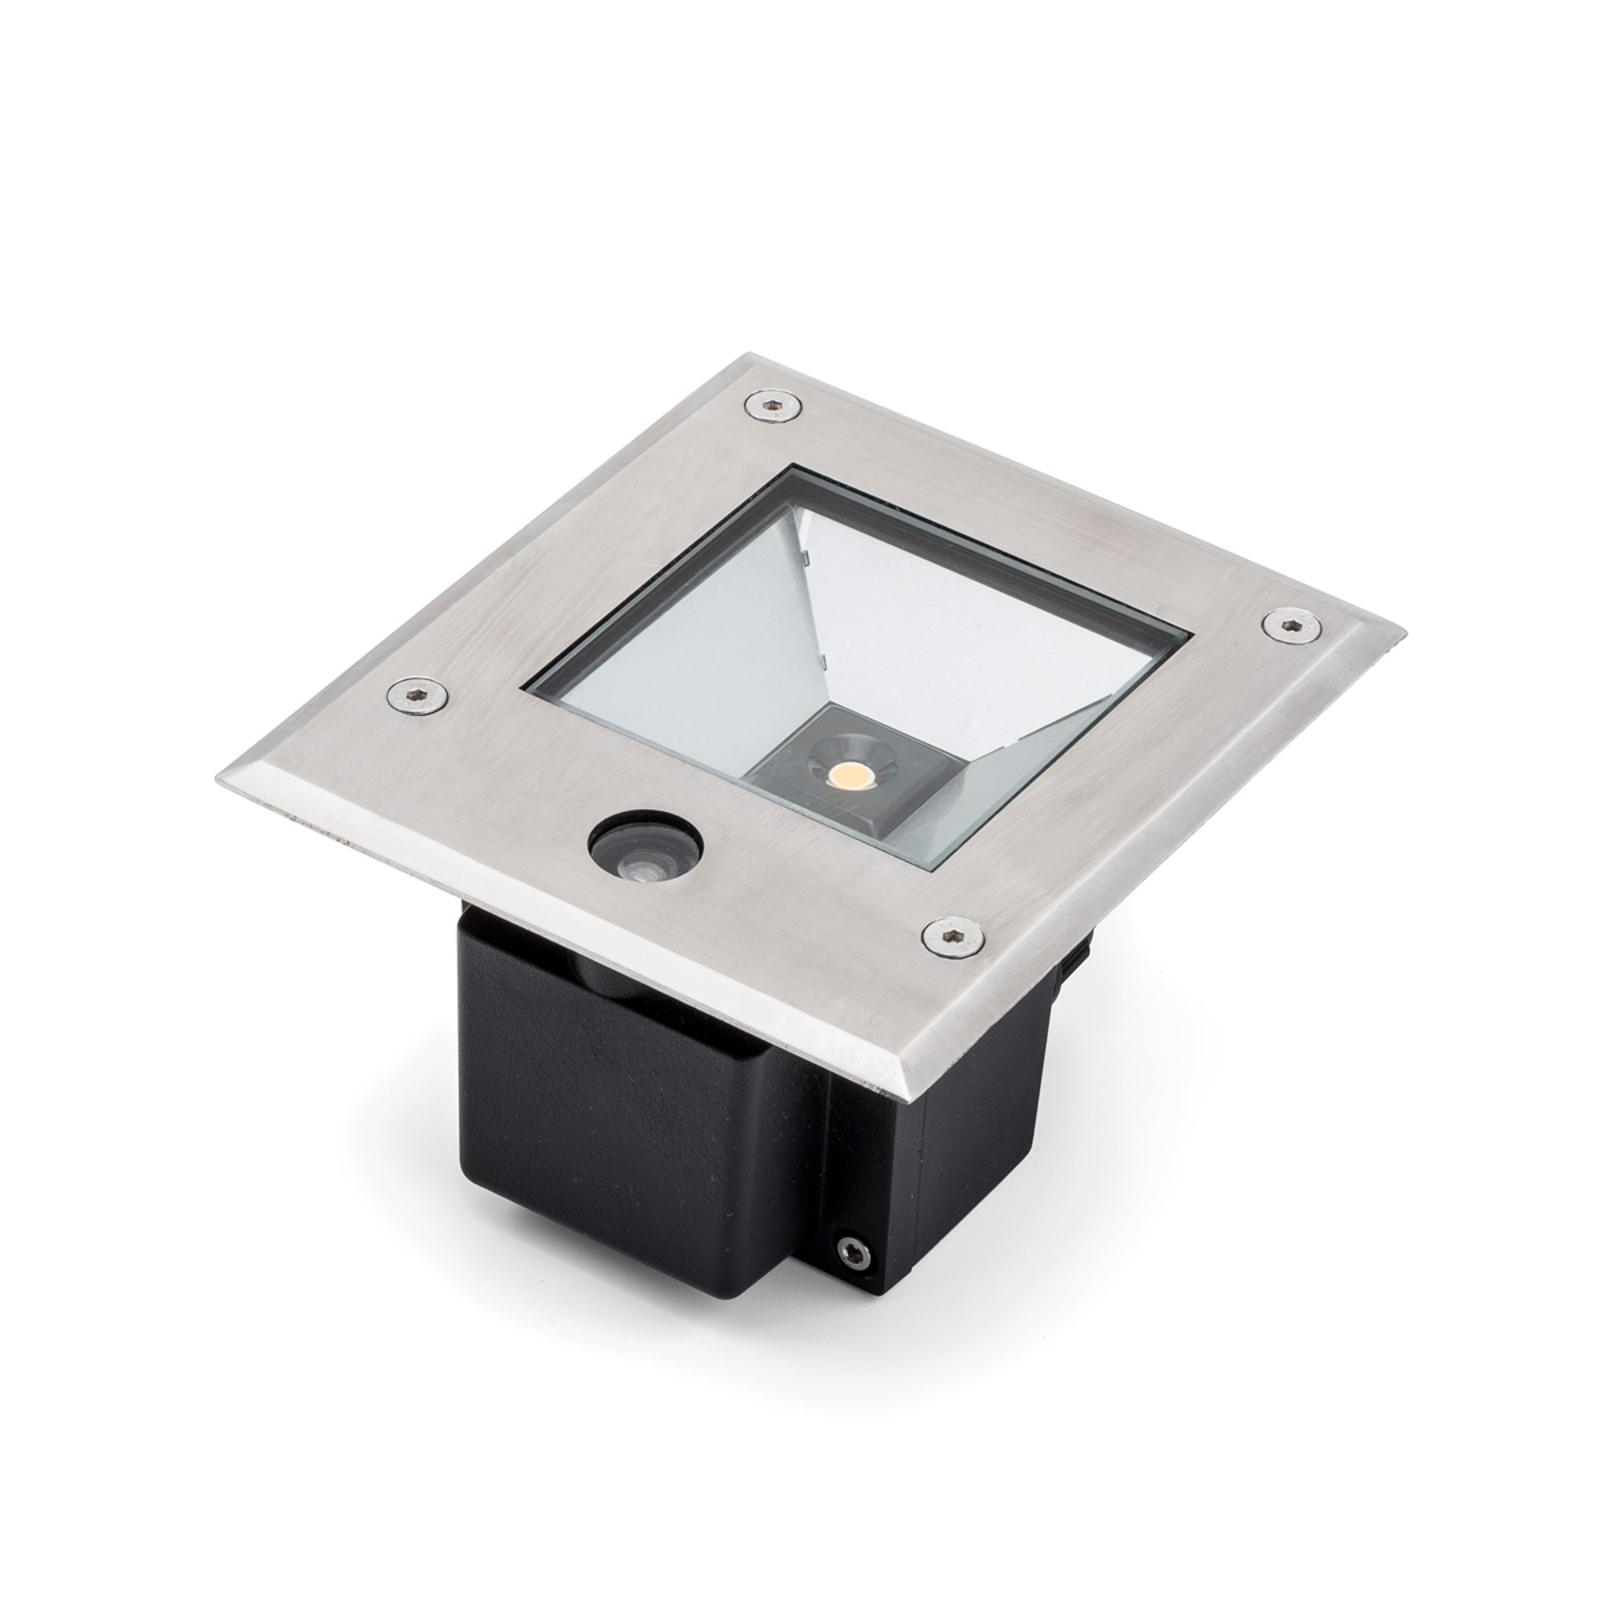 Dale LED grondspot 9 W schemersensor